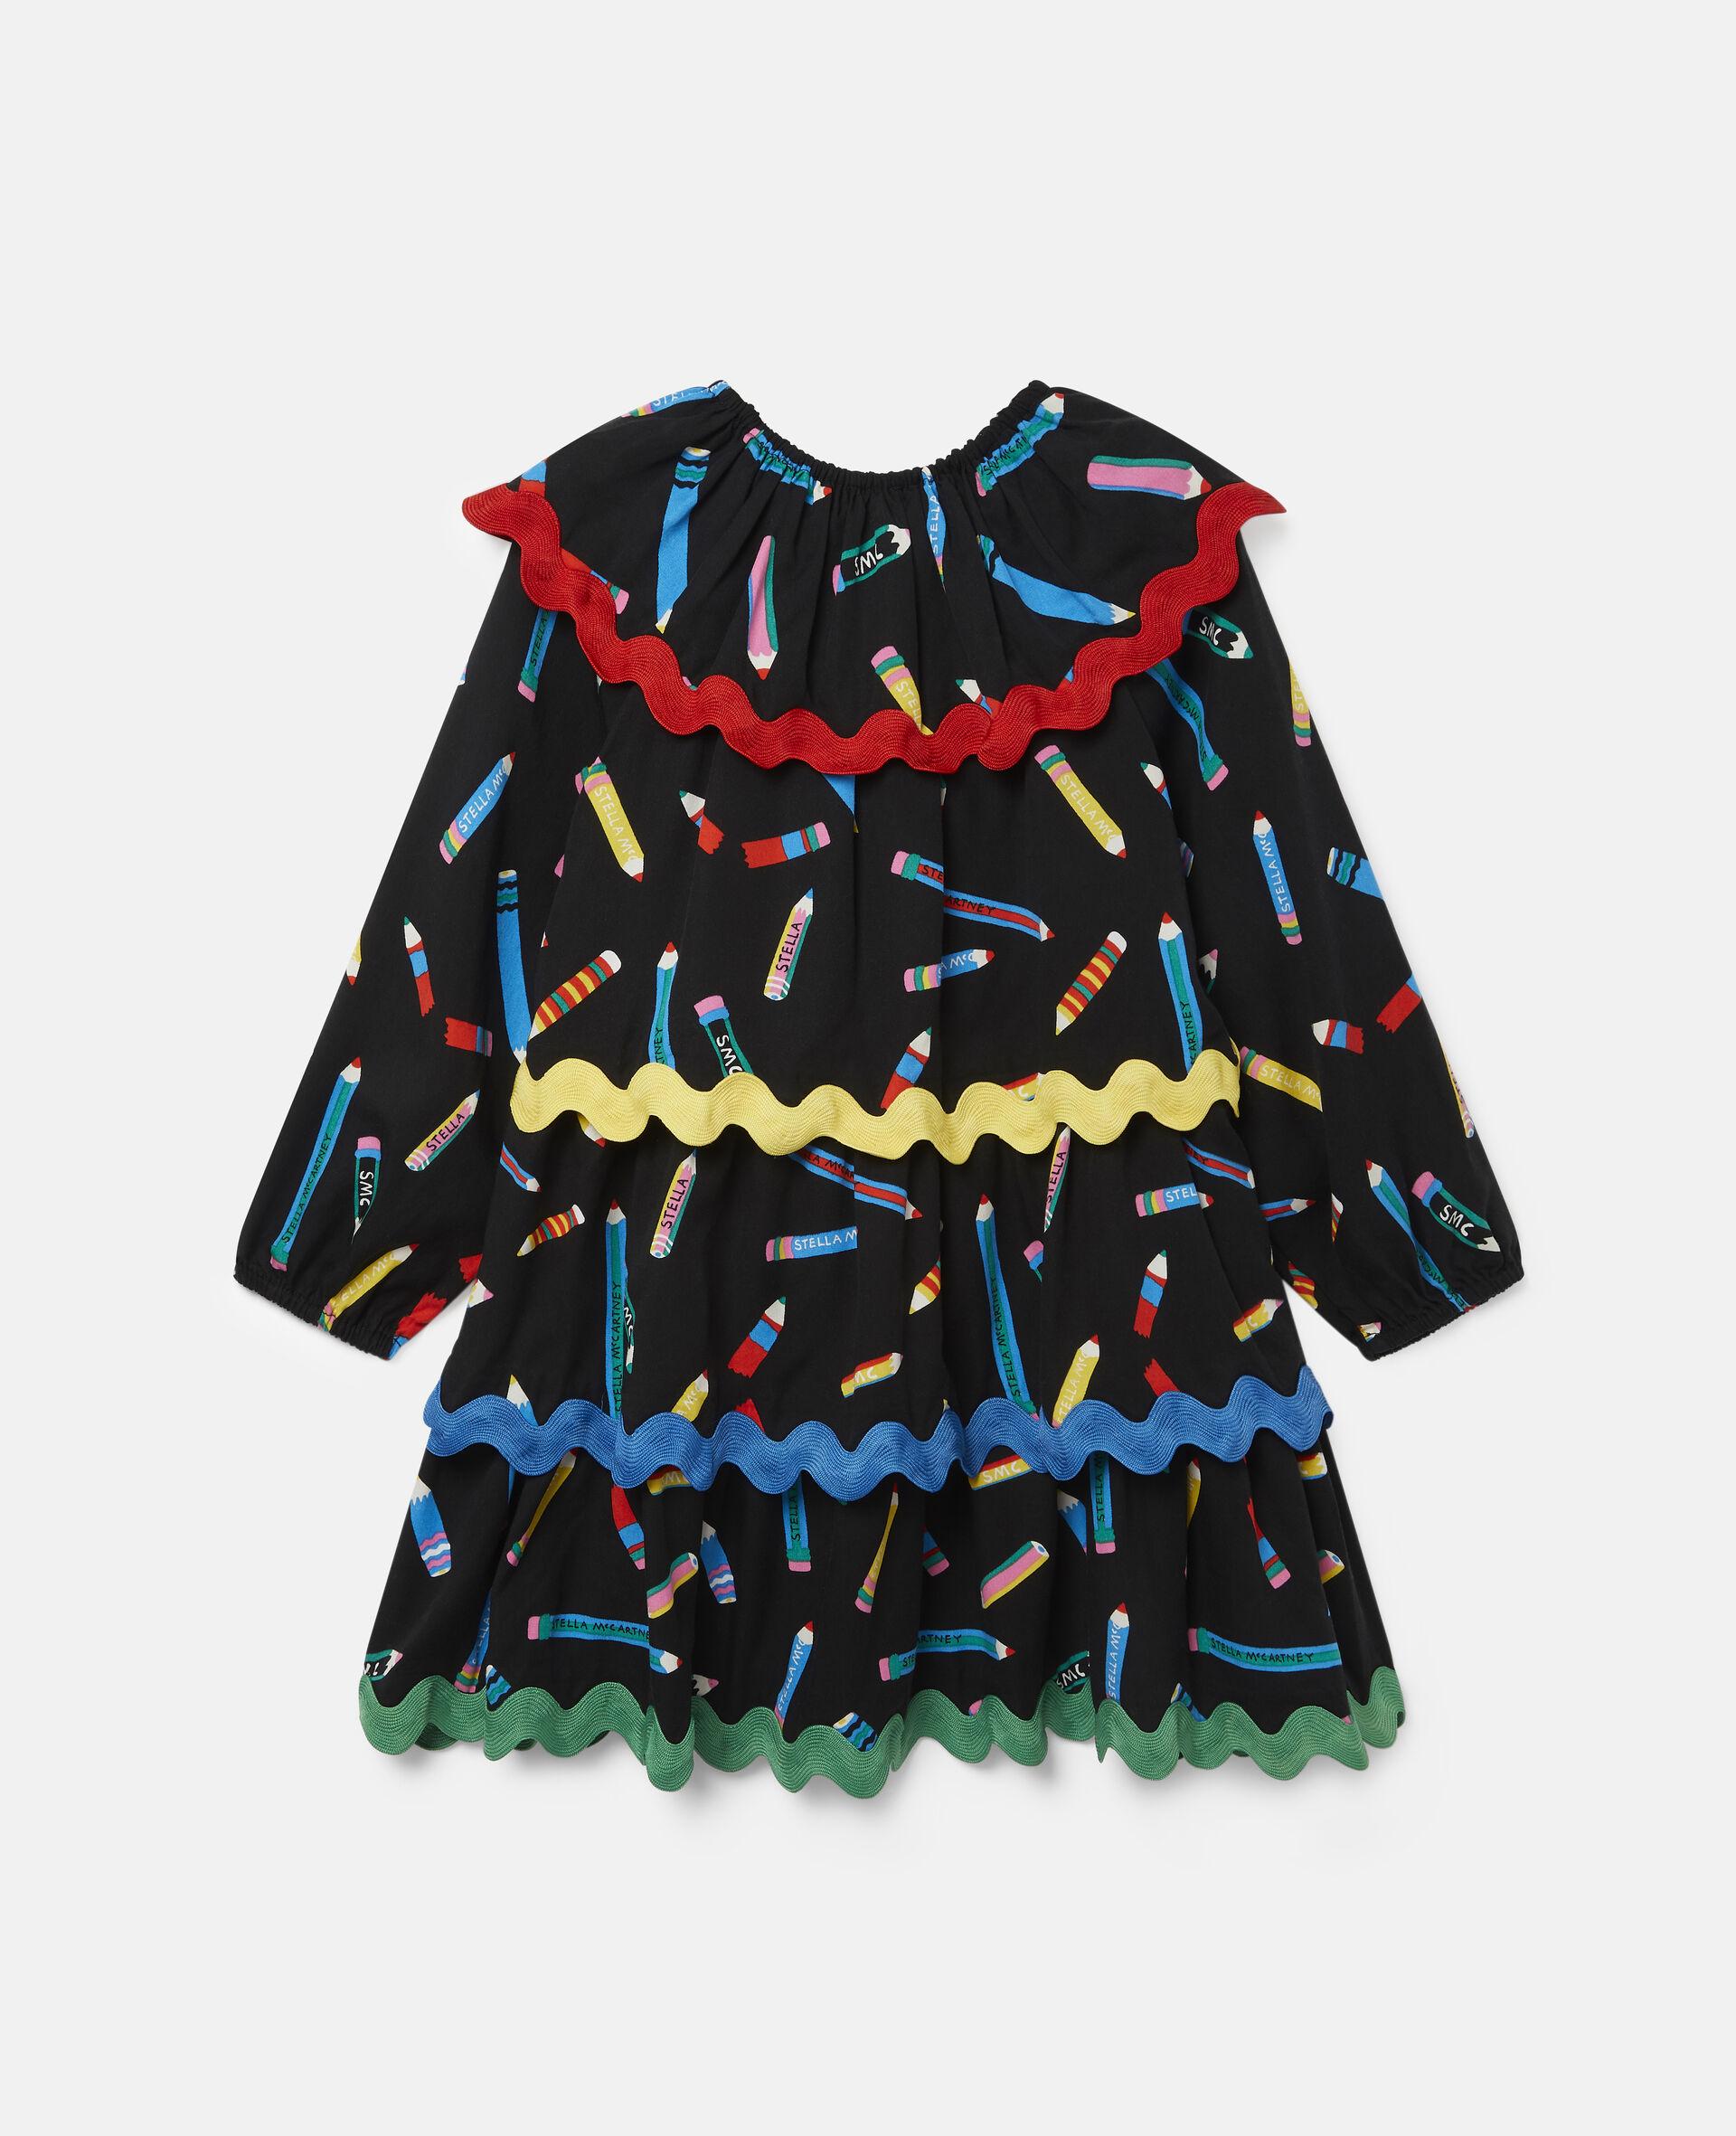 铅笔印花分层斜纹布连衣裙 -黑色-large image number 3